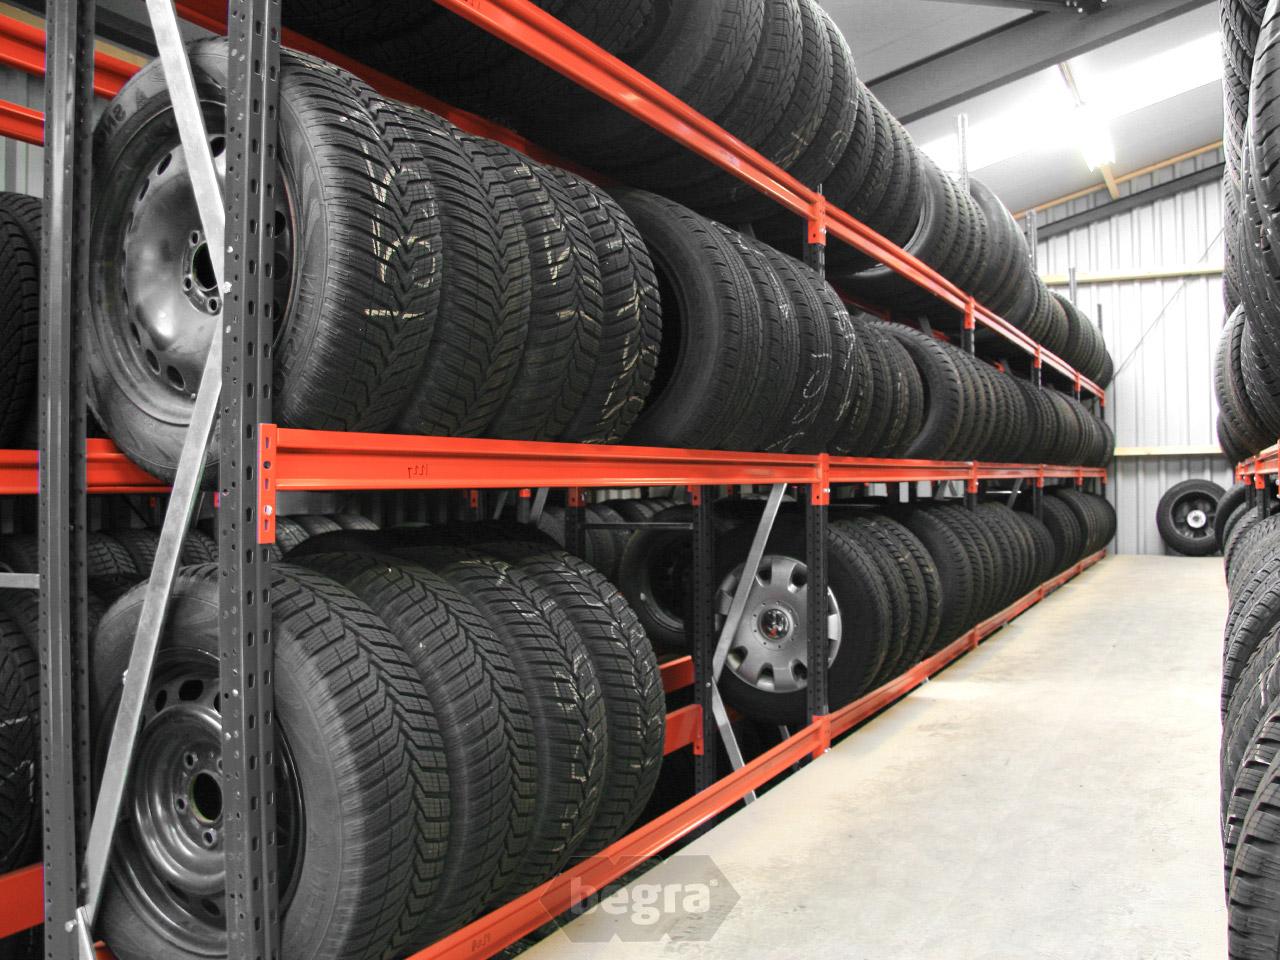 Tire Racks Heavy Duty Tire Racking Begra Storage Solutions